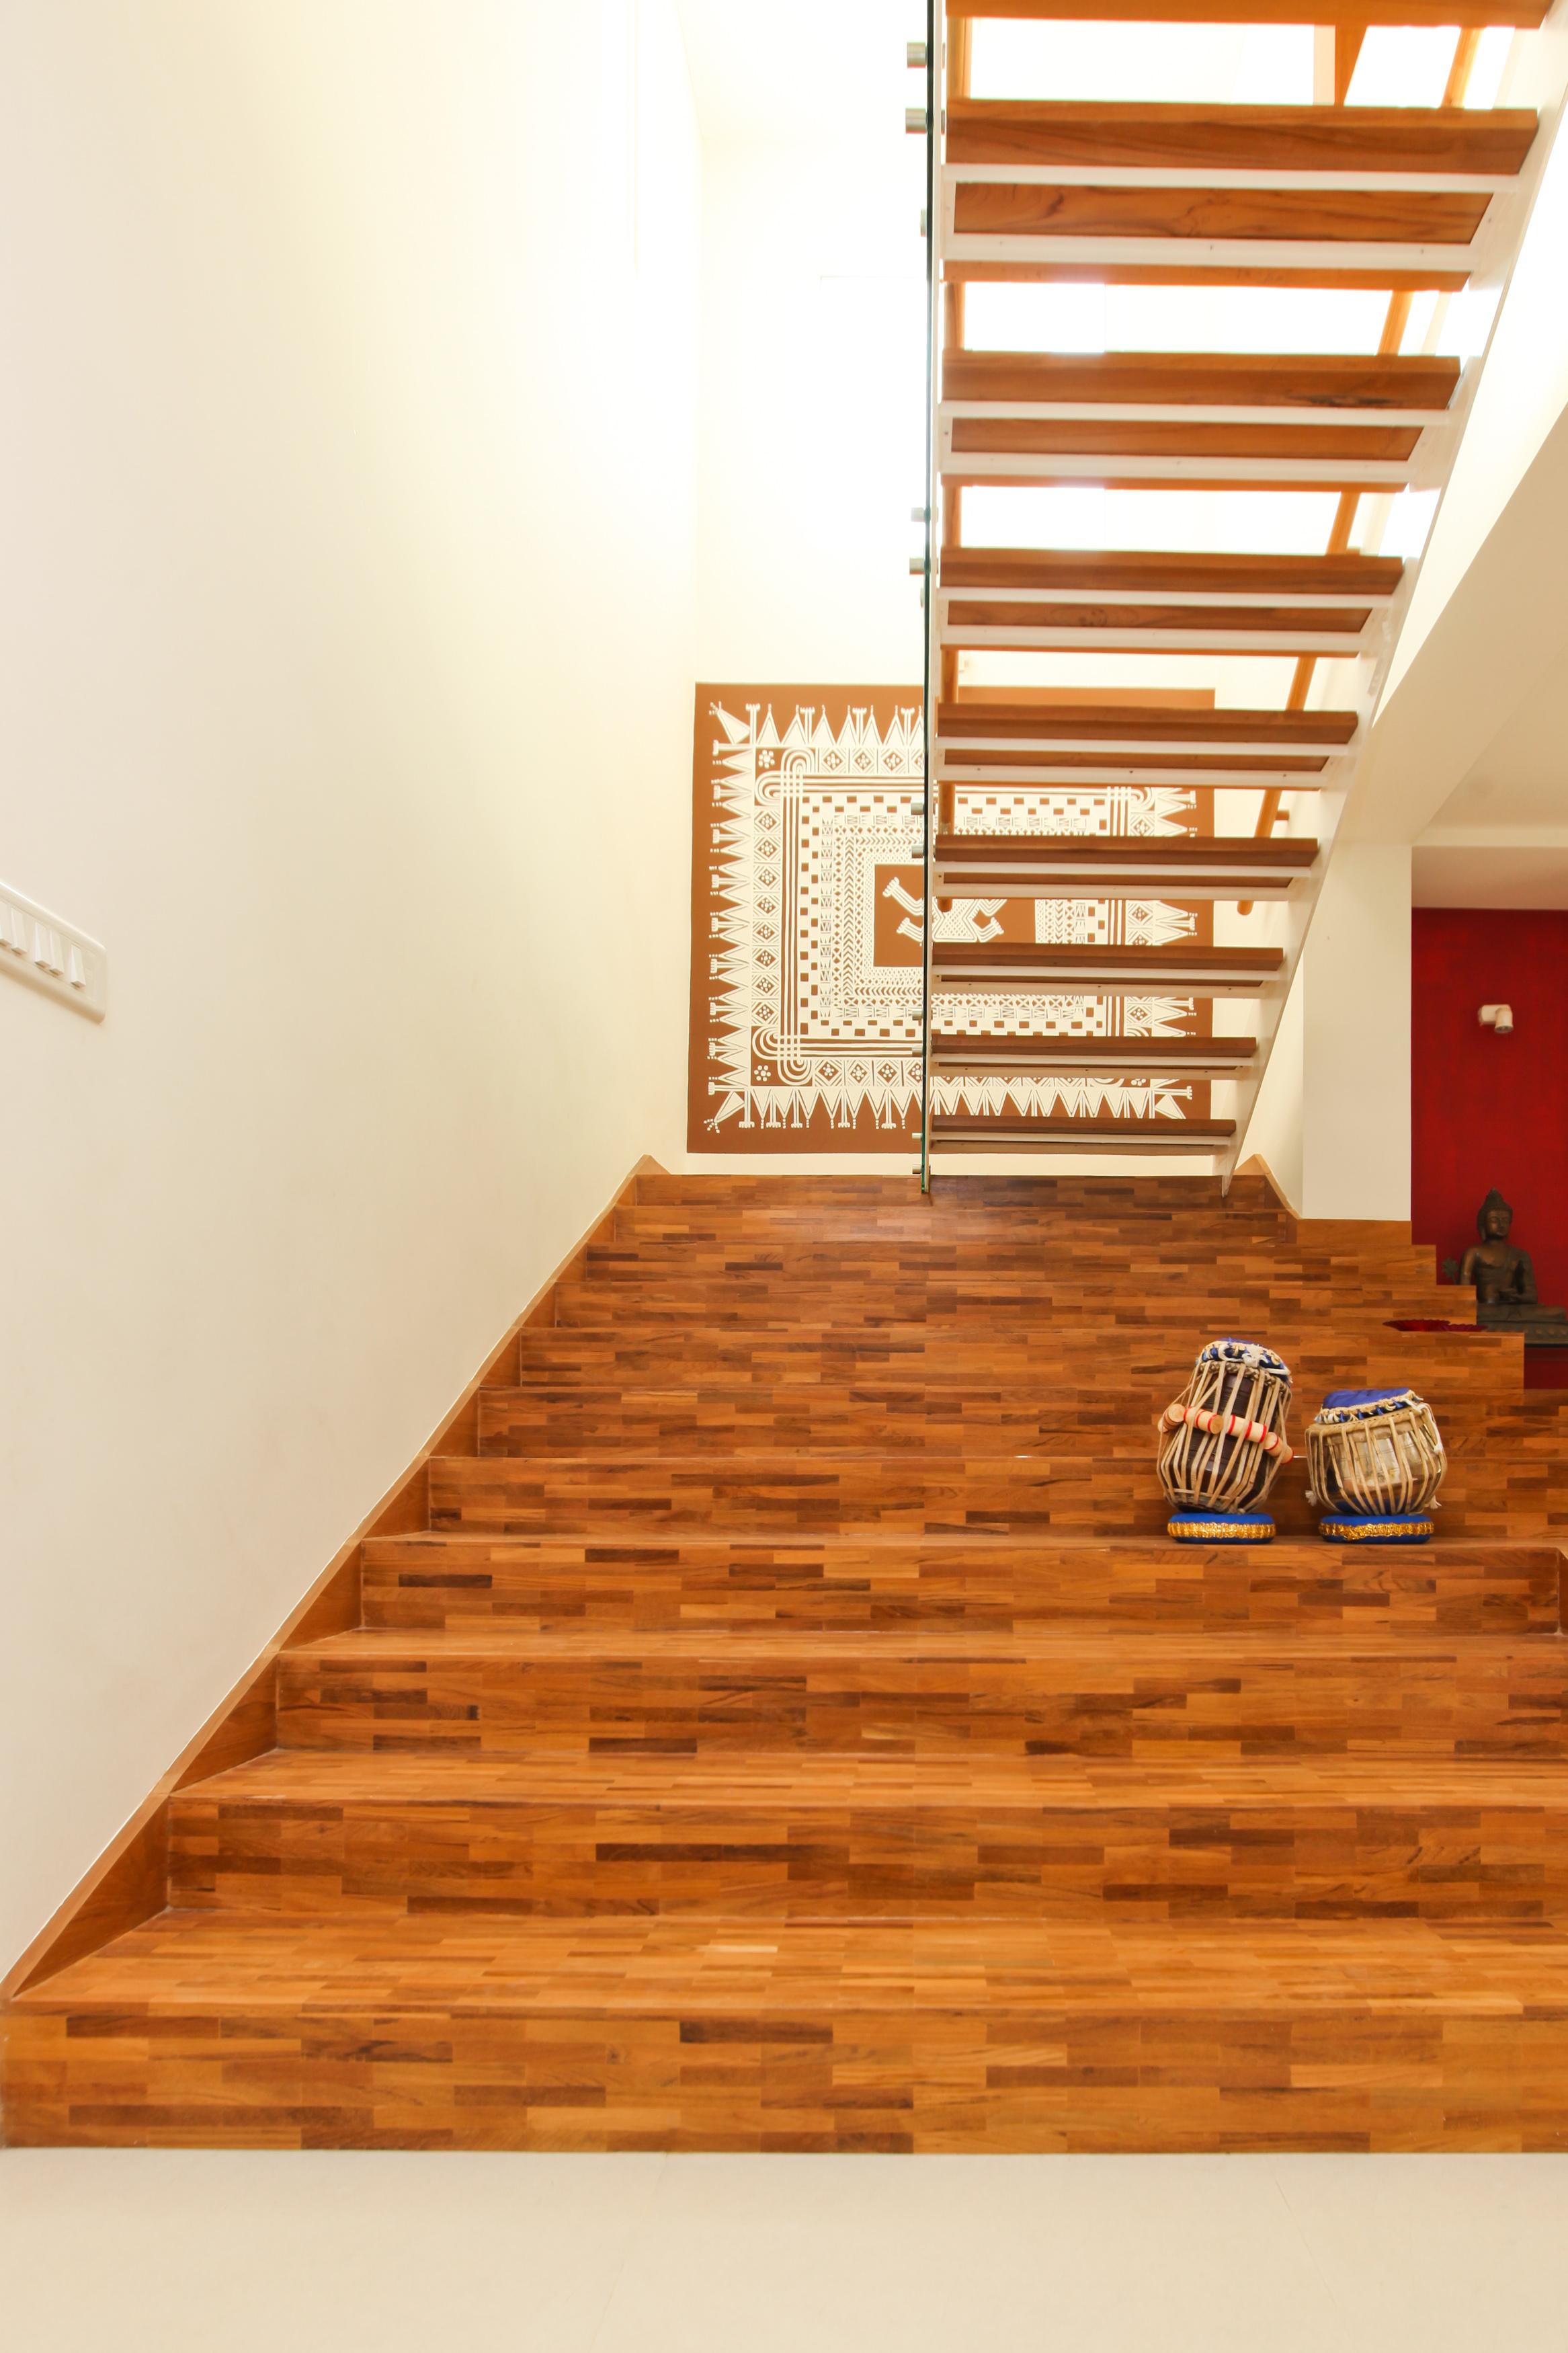 Staircase volume